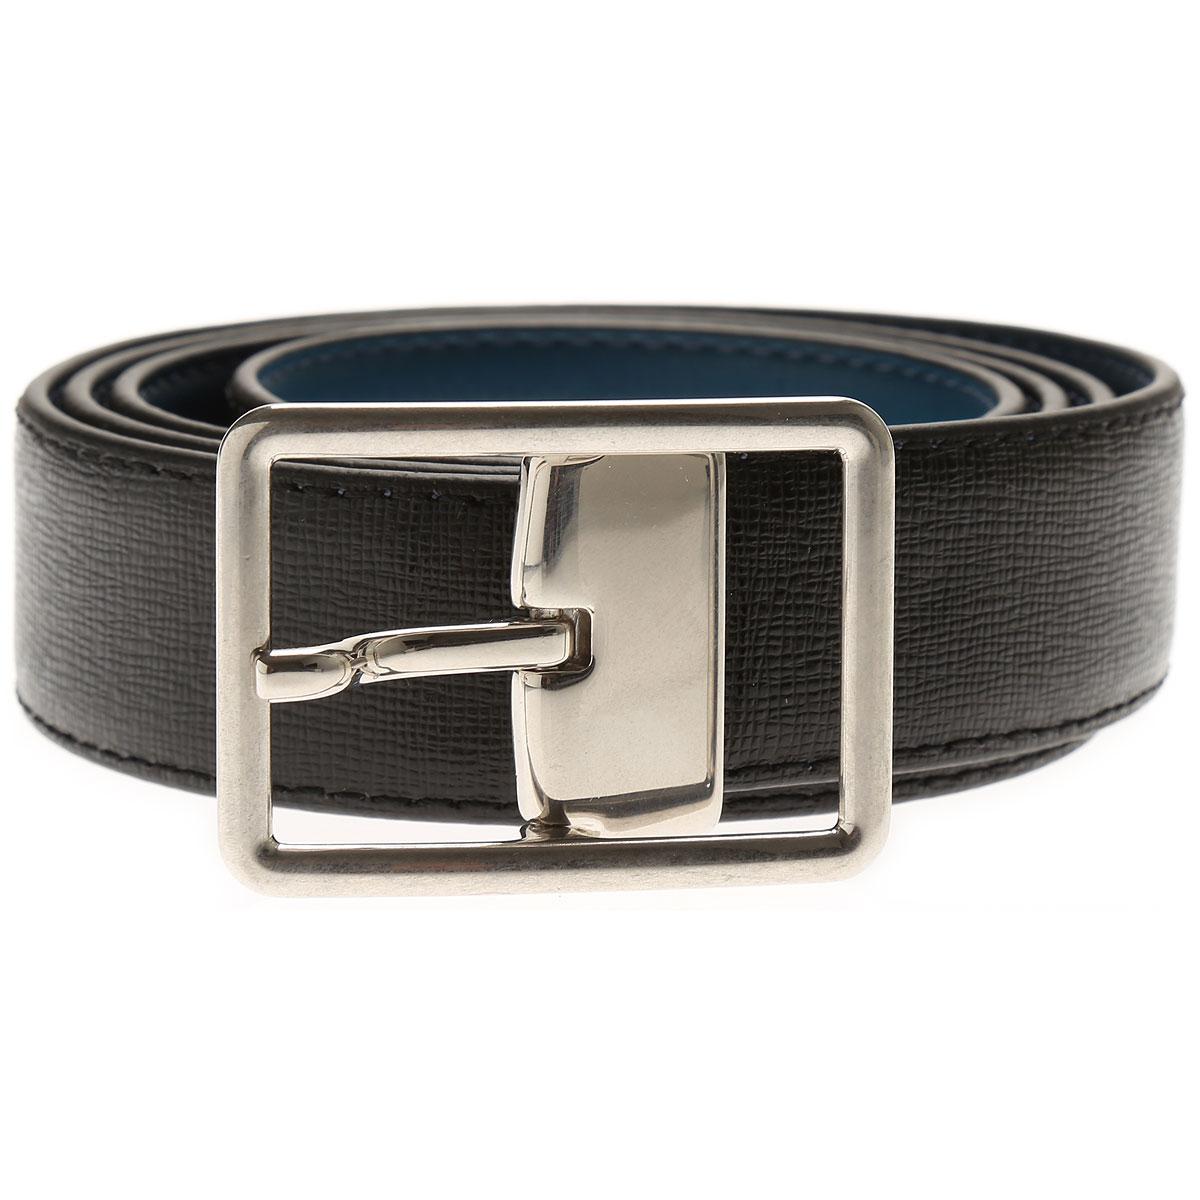 Paul Smith Mens Belts, Black, Leather, 2017, 38 40 42